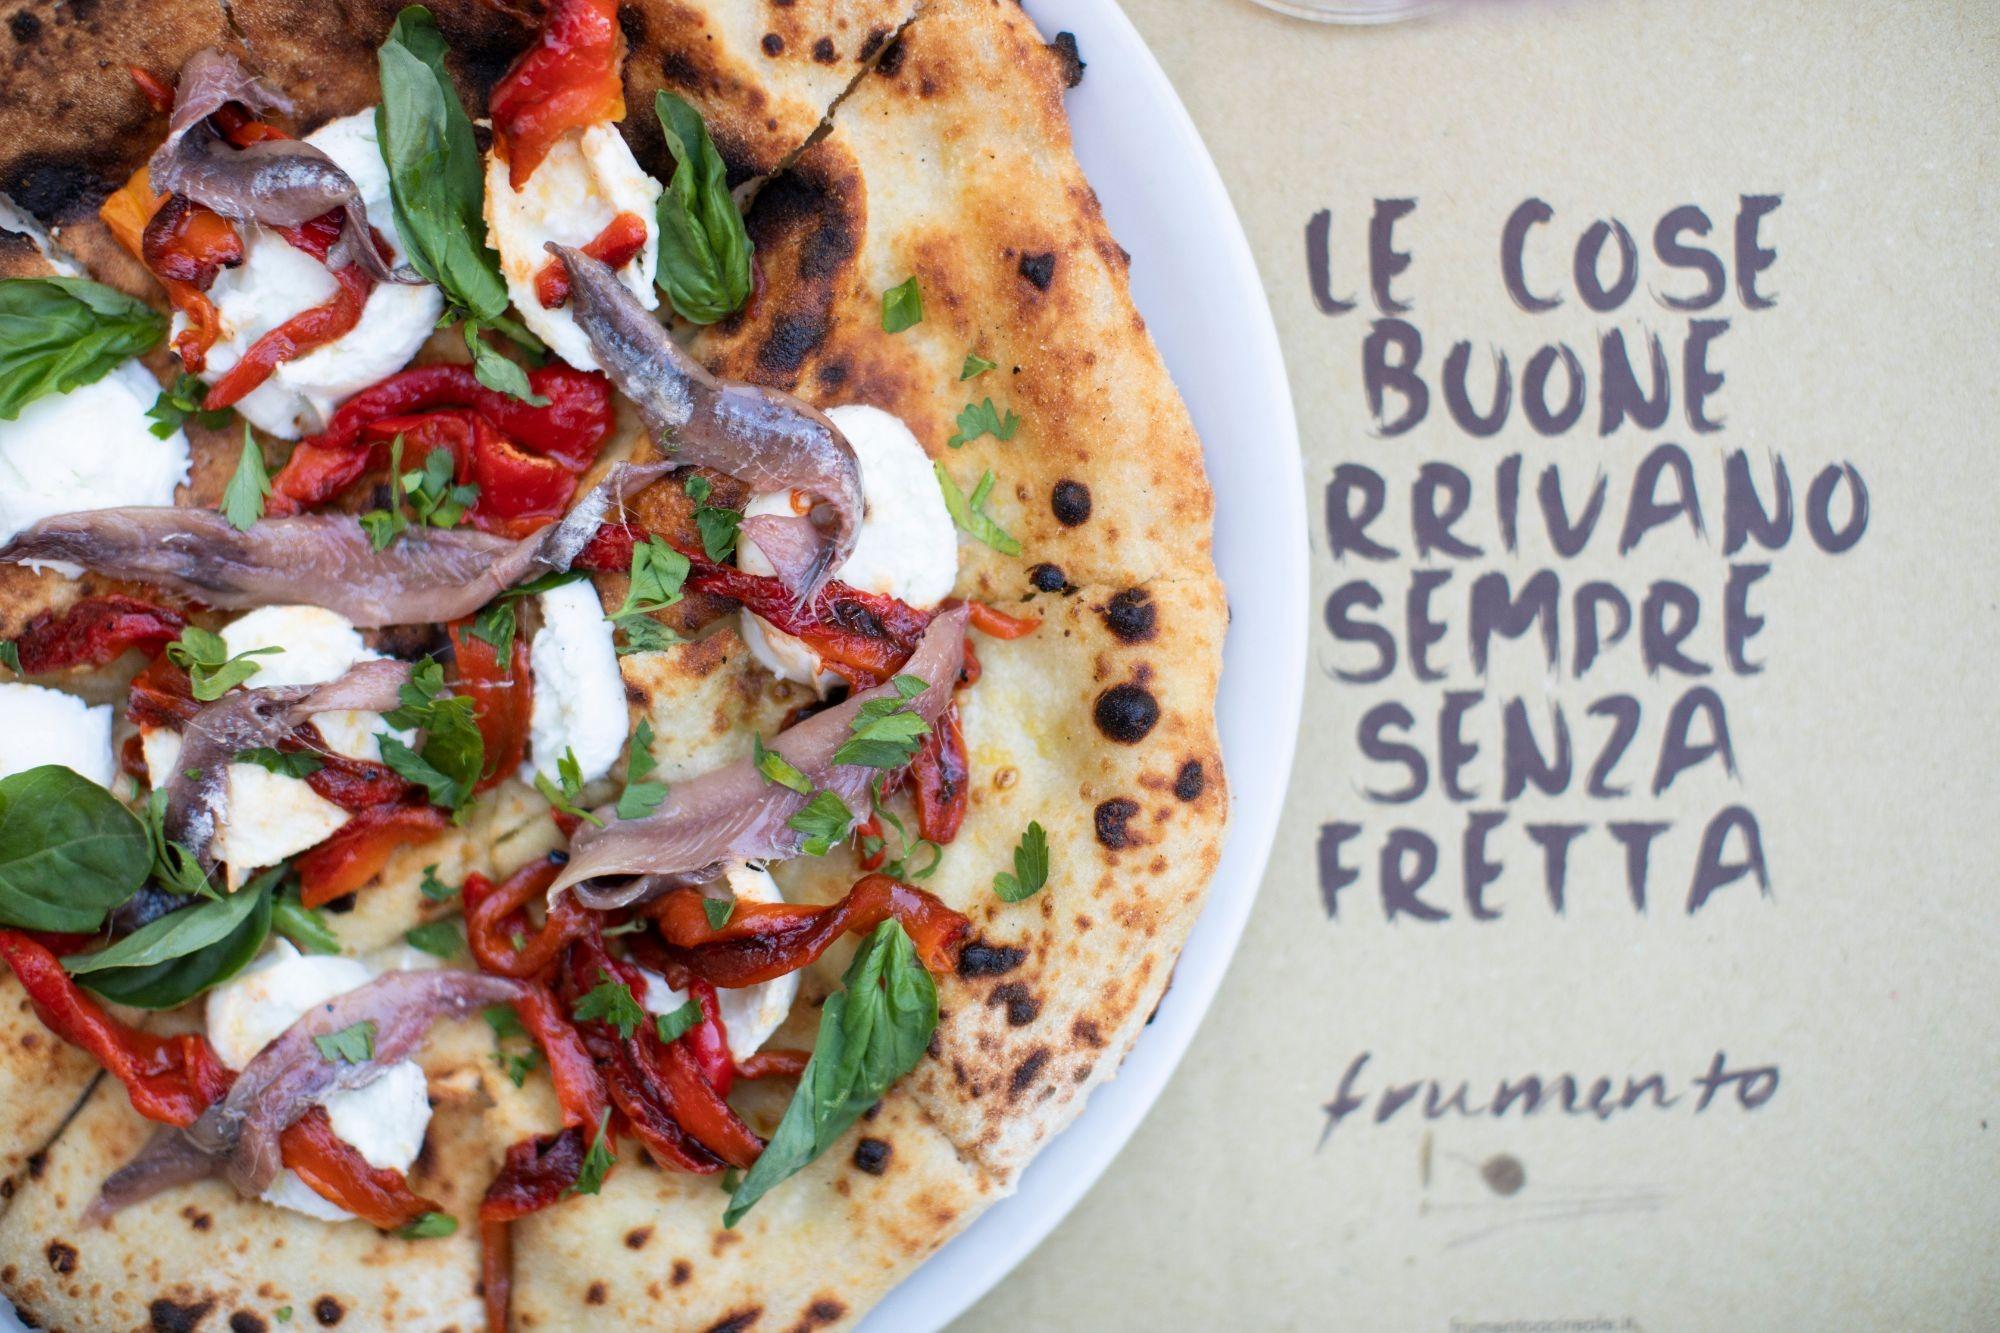 pizzamenufrumento-1602066459.jpg